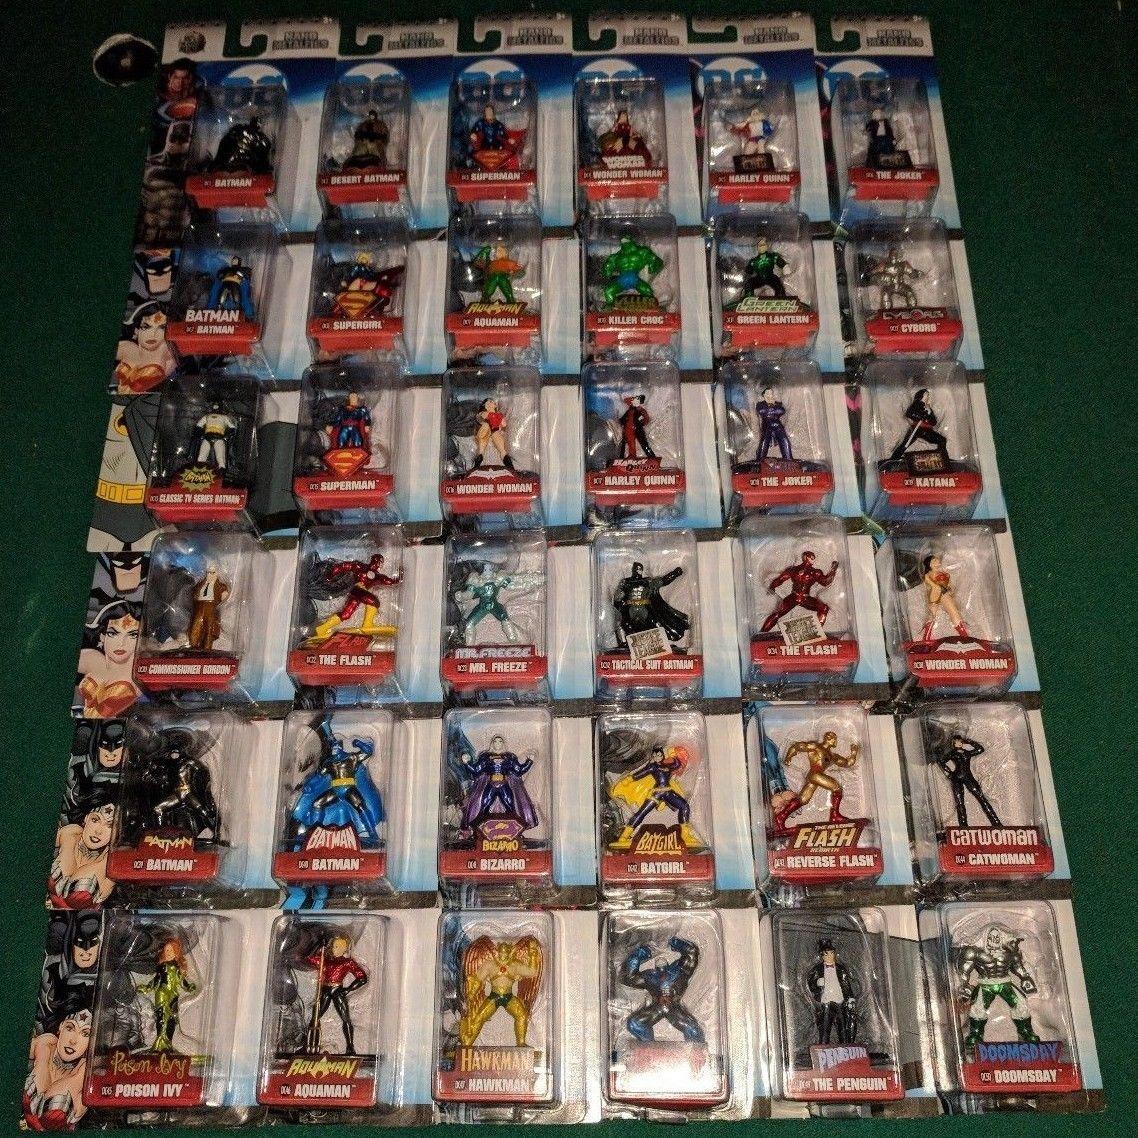 Dc Comics Nano Metalfigs Complete Set Of 36 Metal Figures Wave 1 2 3 Rare Htf 150 00 End Date Saturday Mar 31 2018 8 56 33 Pdt Buy It